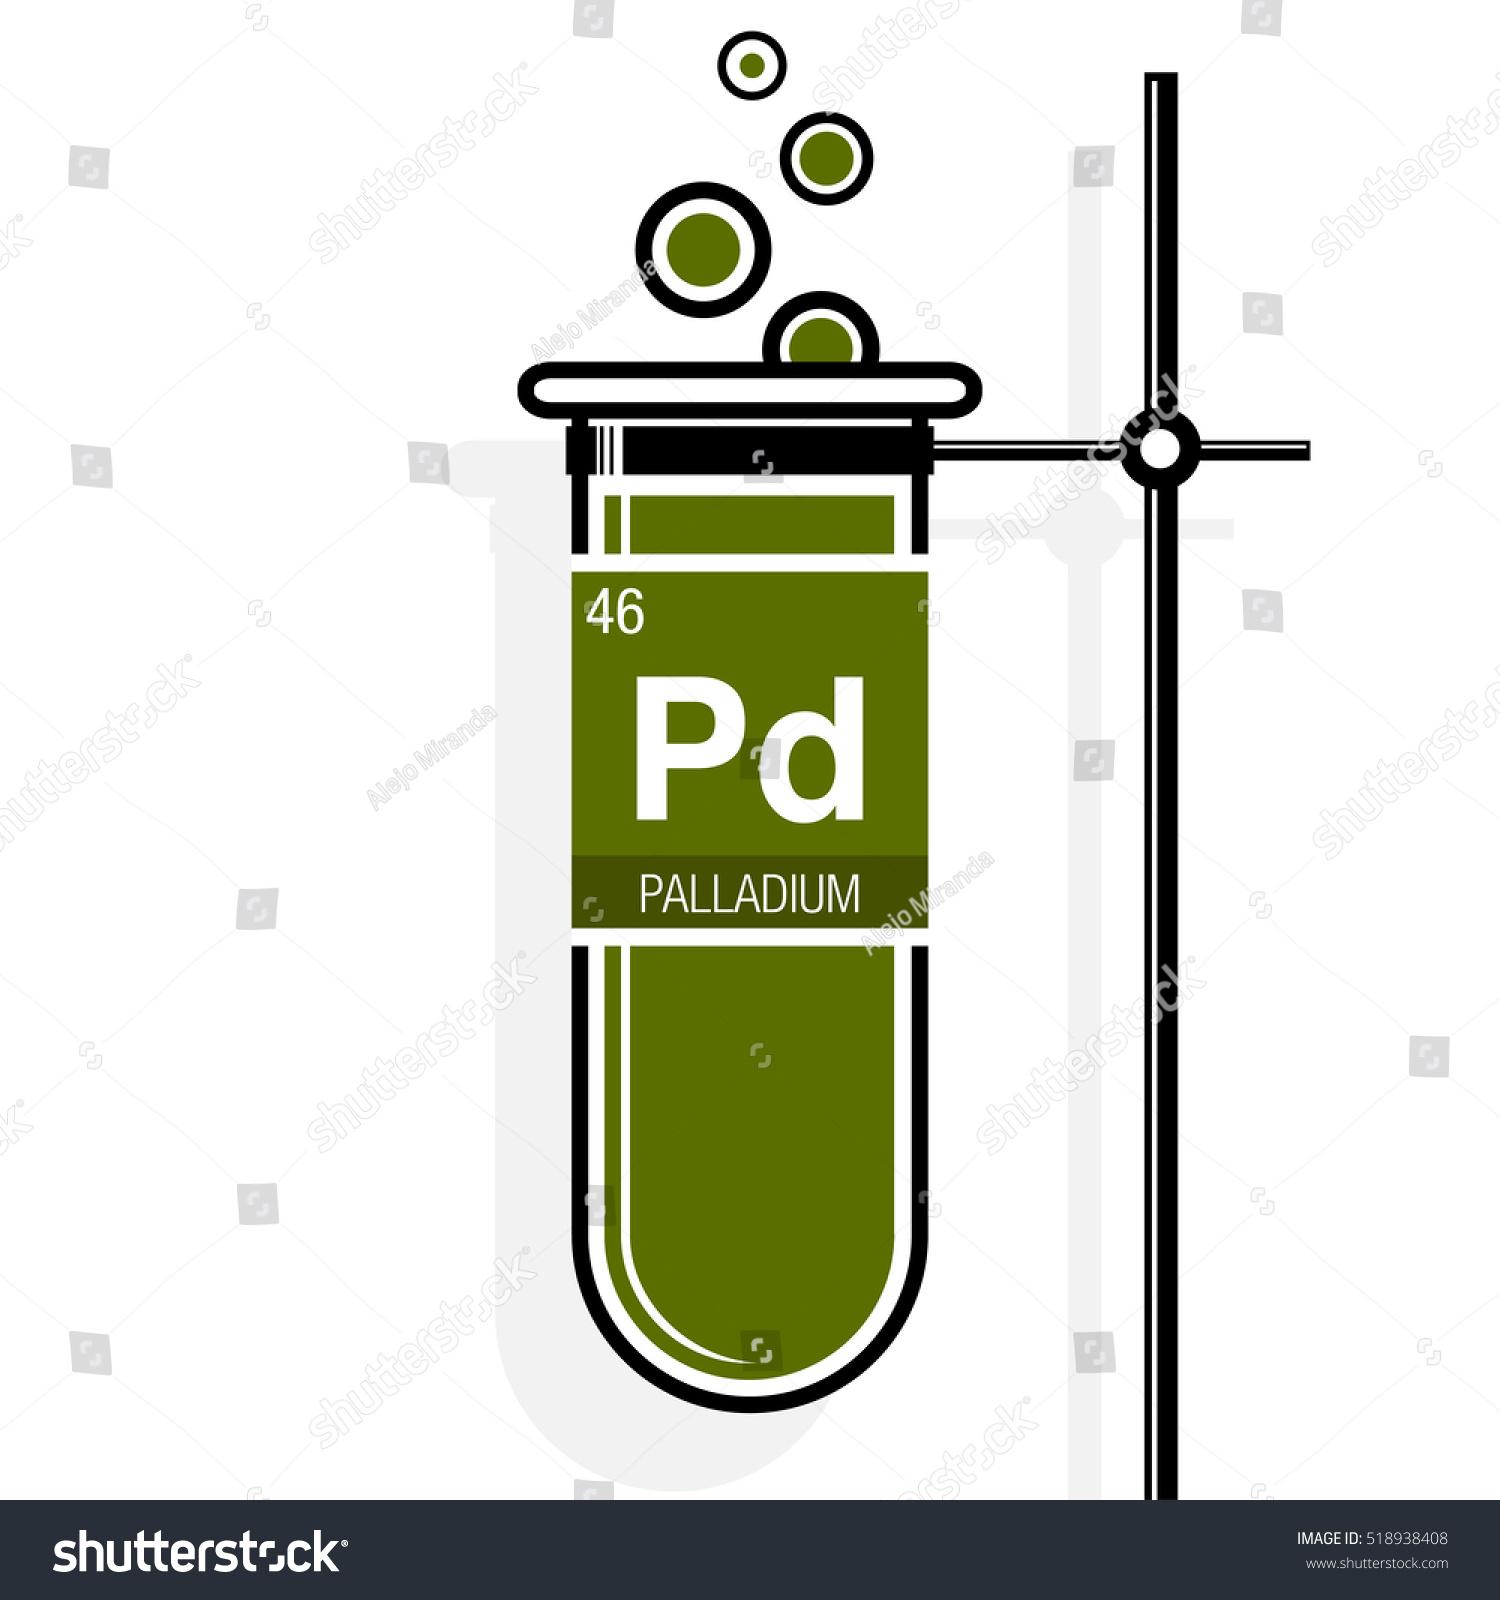 Palladium Symbol On Label Green Test Stock Vector 518938408